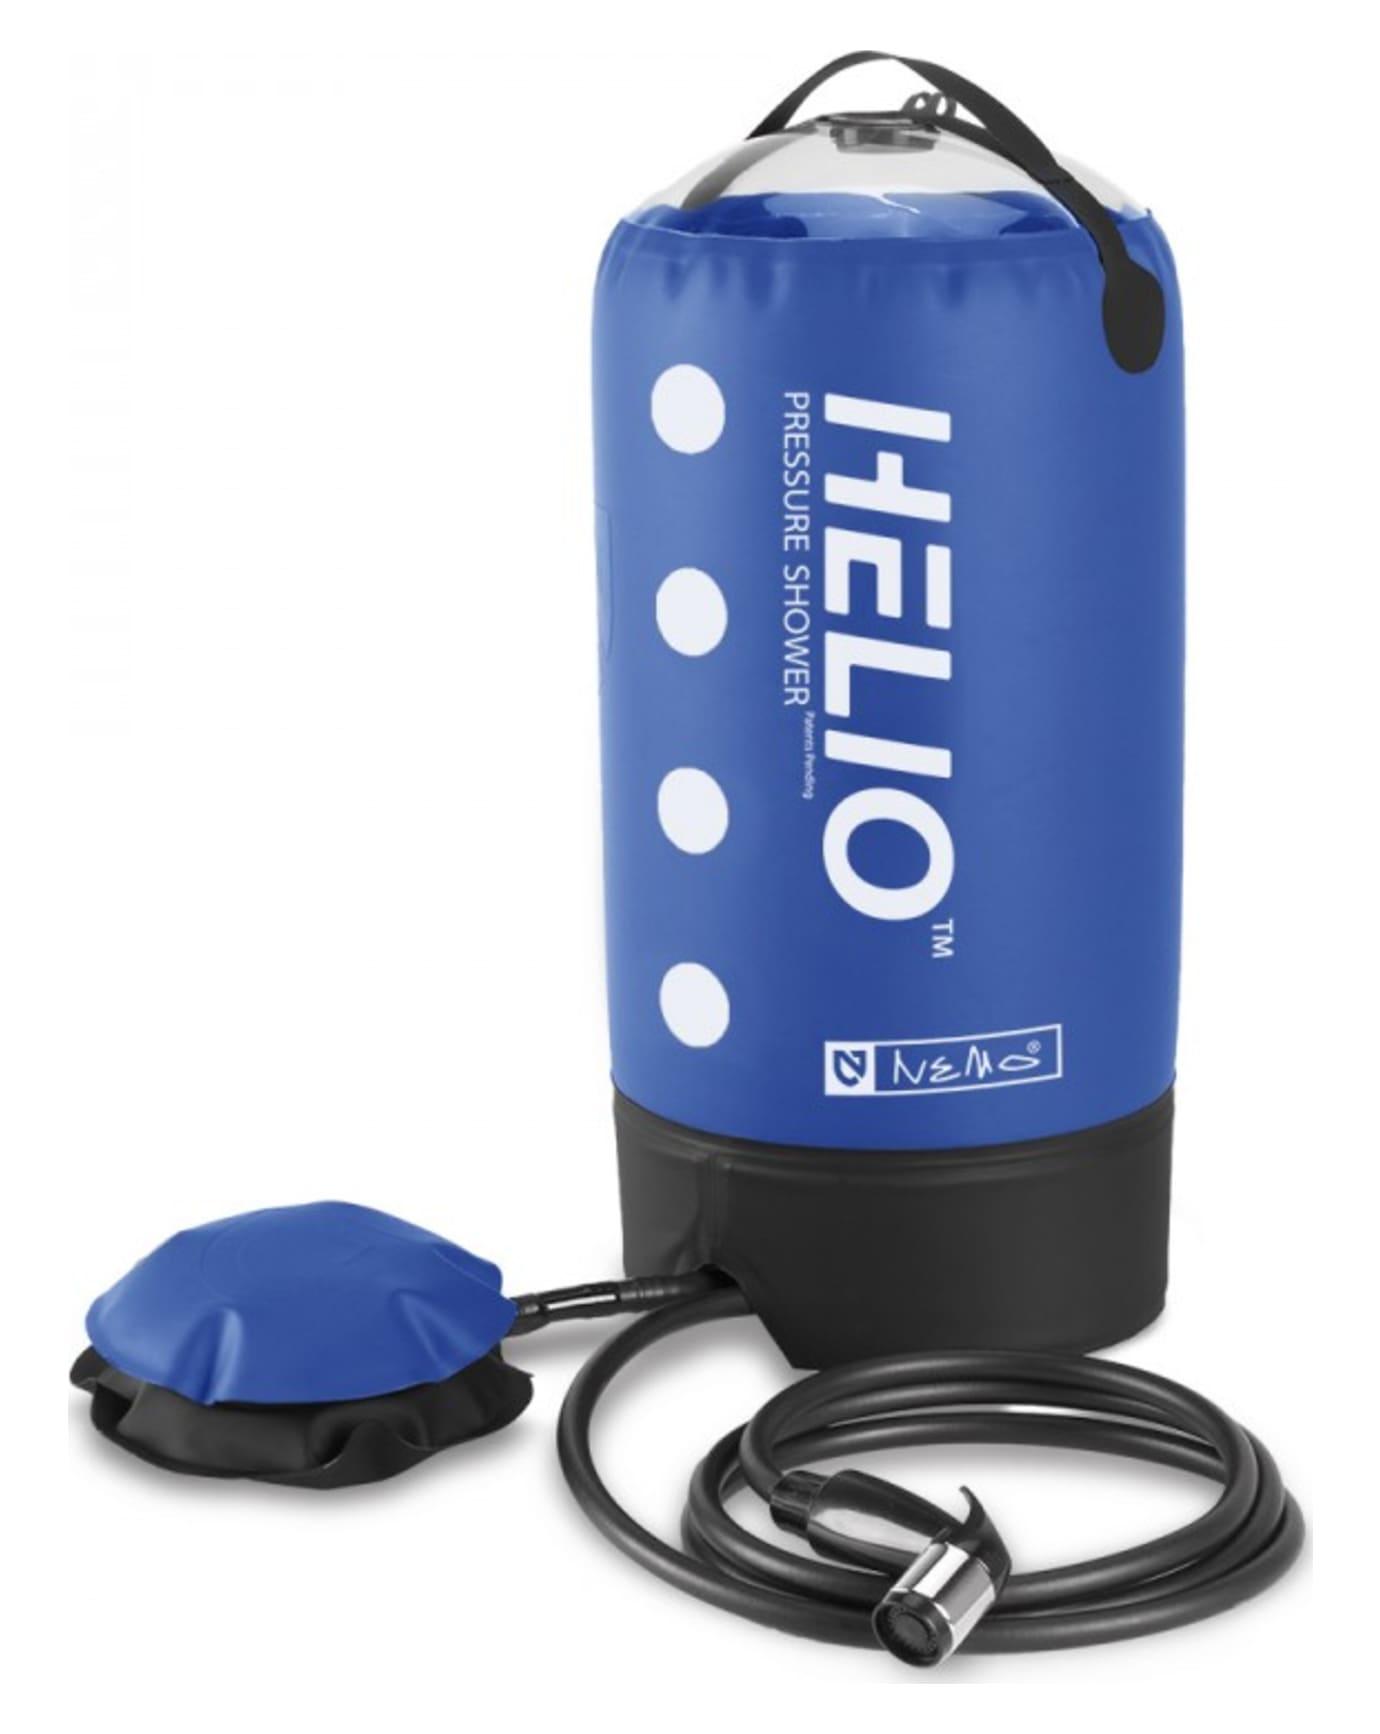 Nemo Helio Pressure Shower Ocean